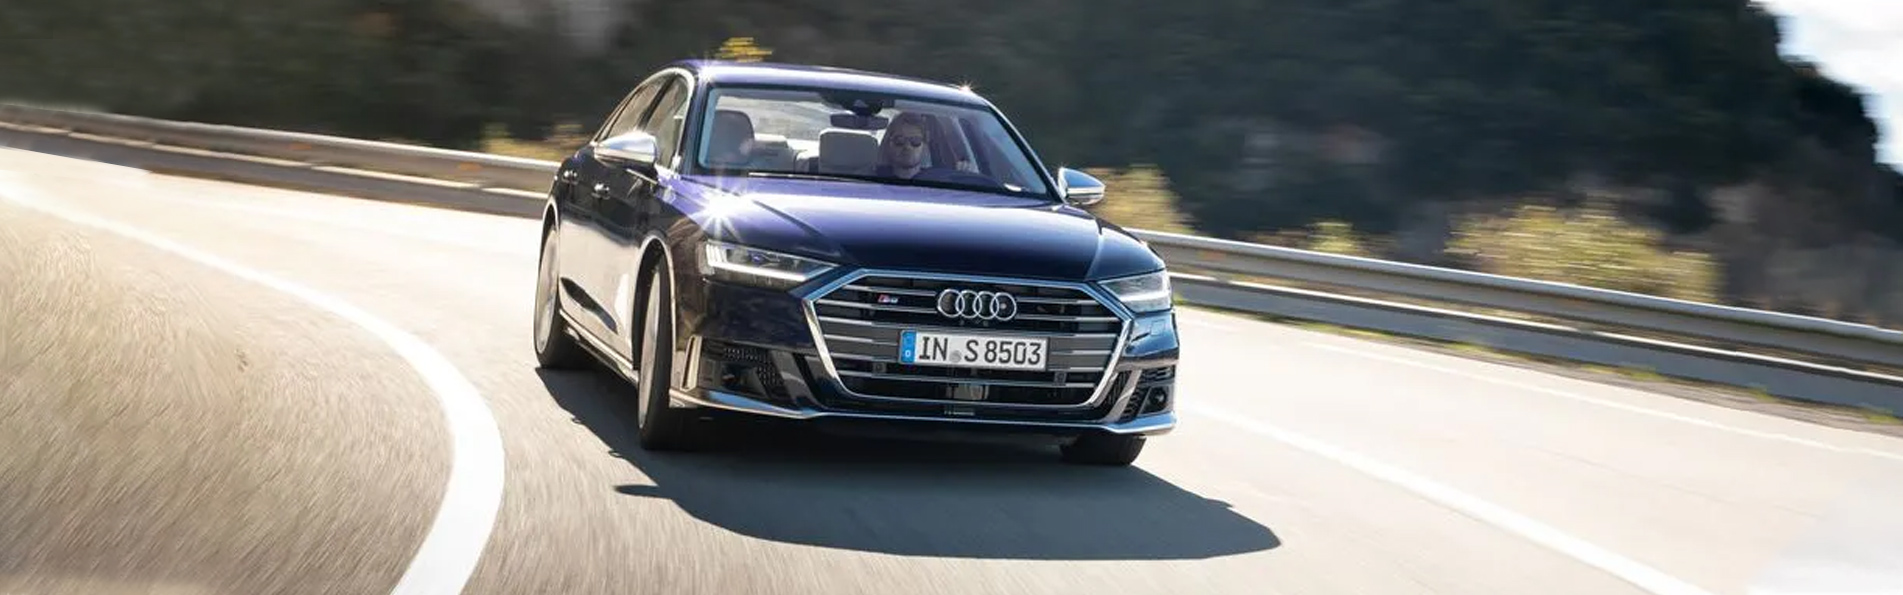 Ảnh ngoại thất Audi S8-1